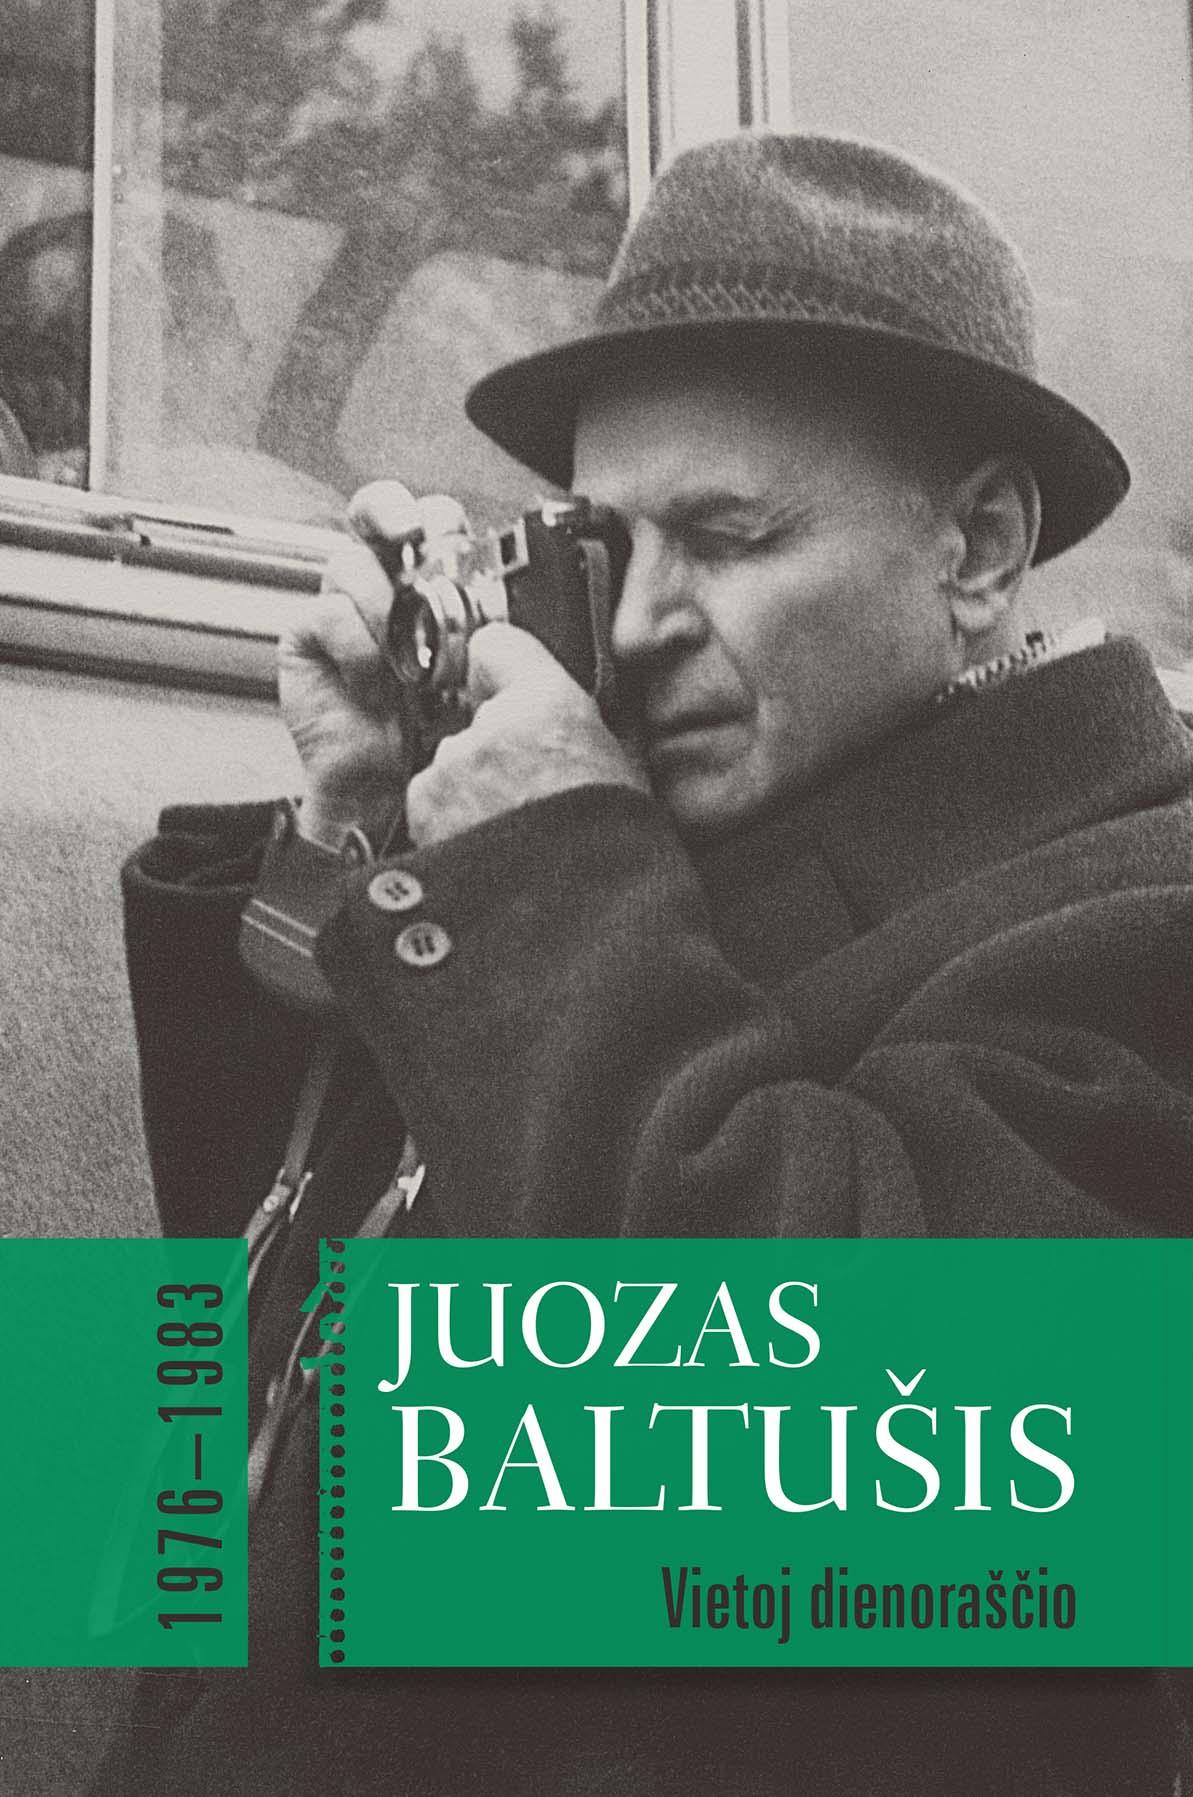 Juozas Baltušis - Vietoj dienoraščio, 1976–1983